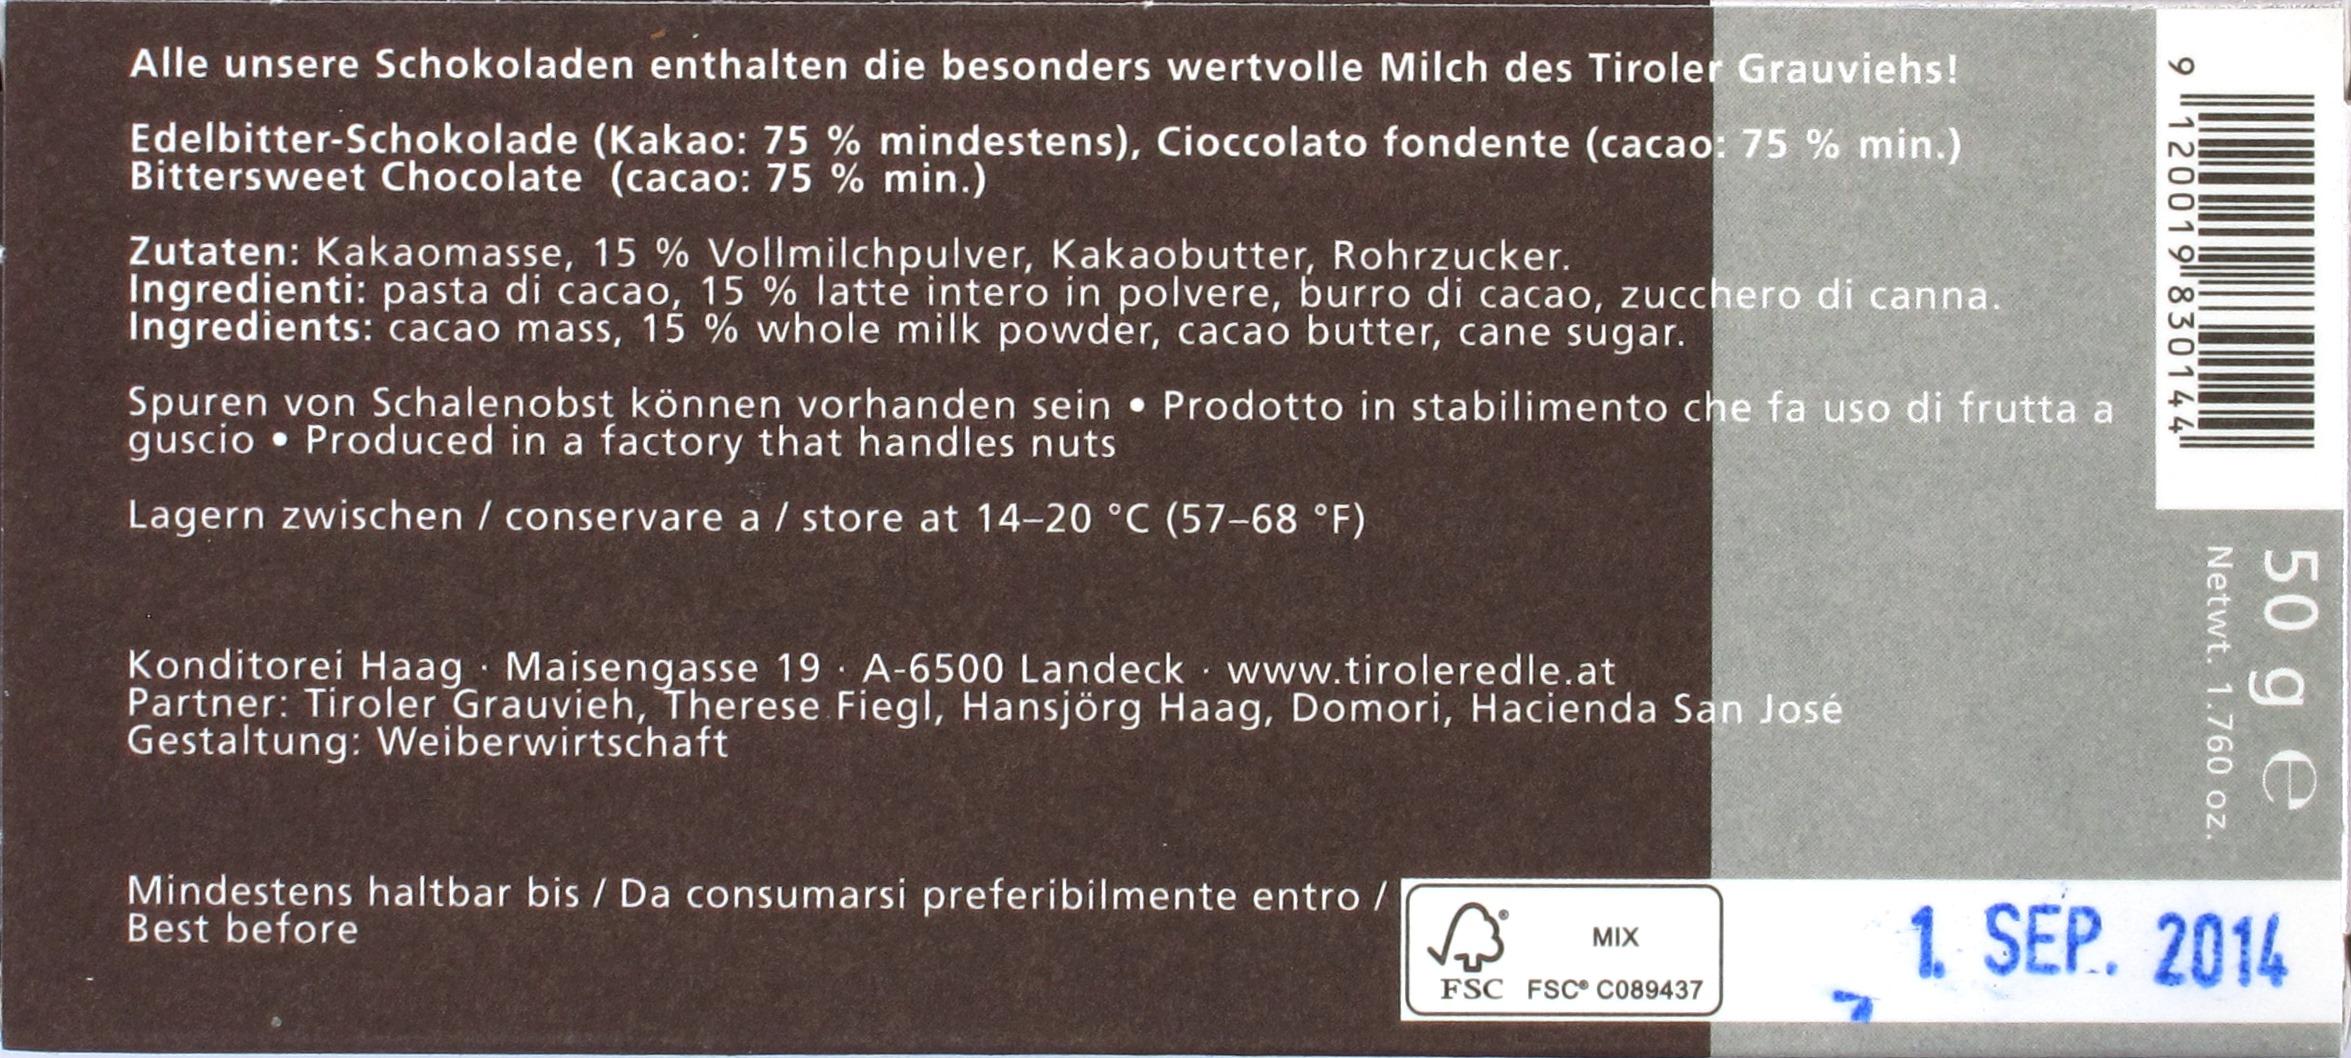 Tiroler Edle Grauvieh-Rio-Caribe-75%-Bittermilchschokolade, Rückseite